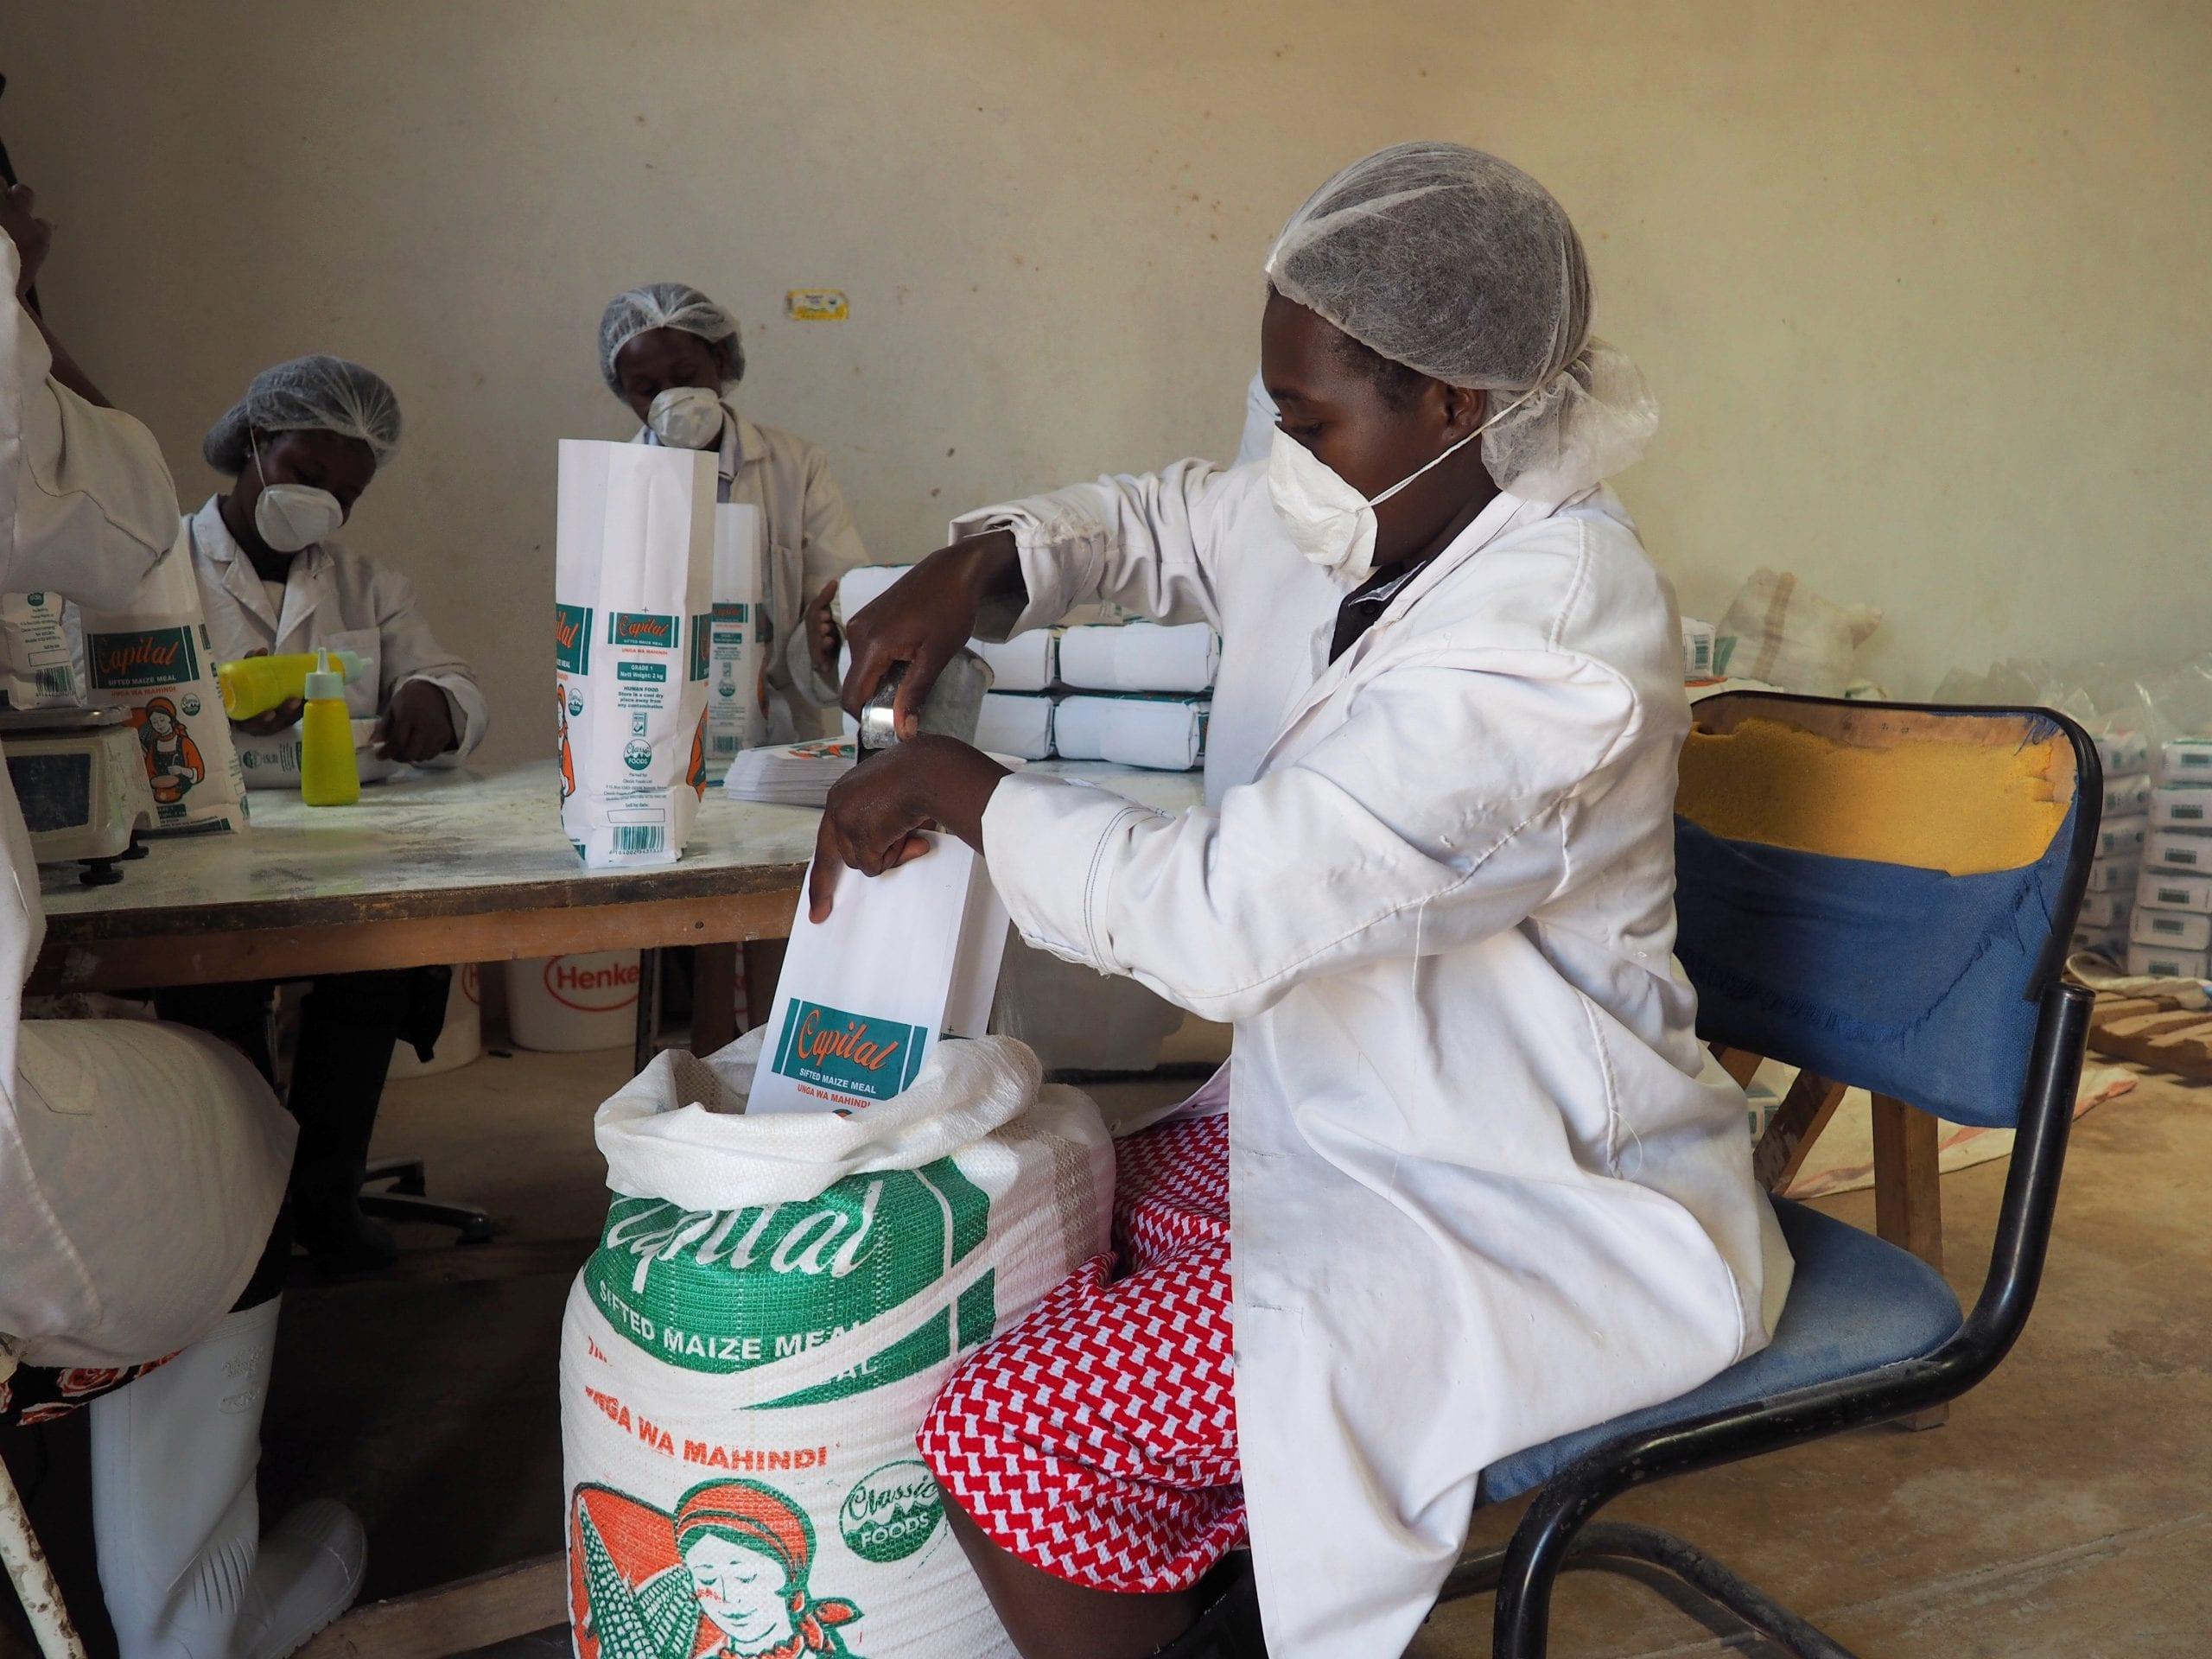 A food processing facility in Kenya